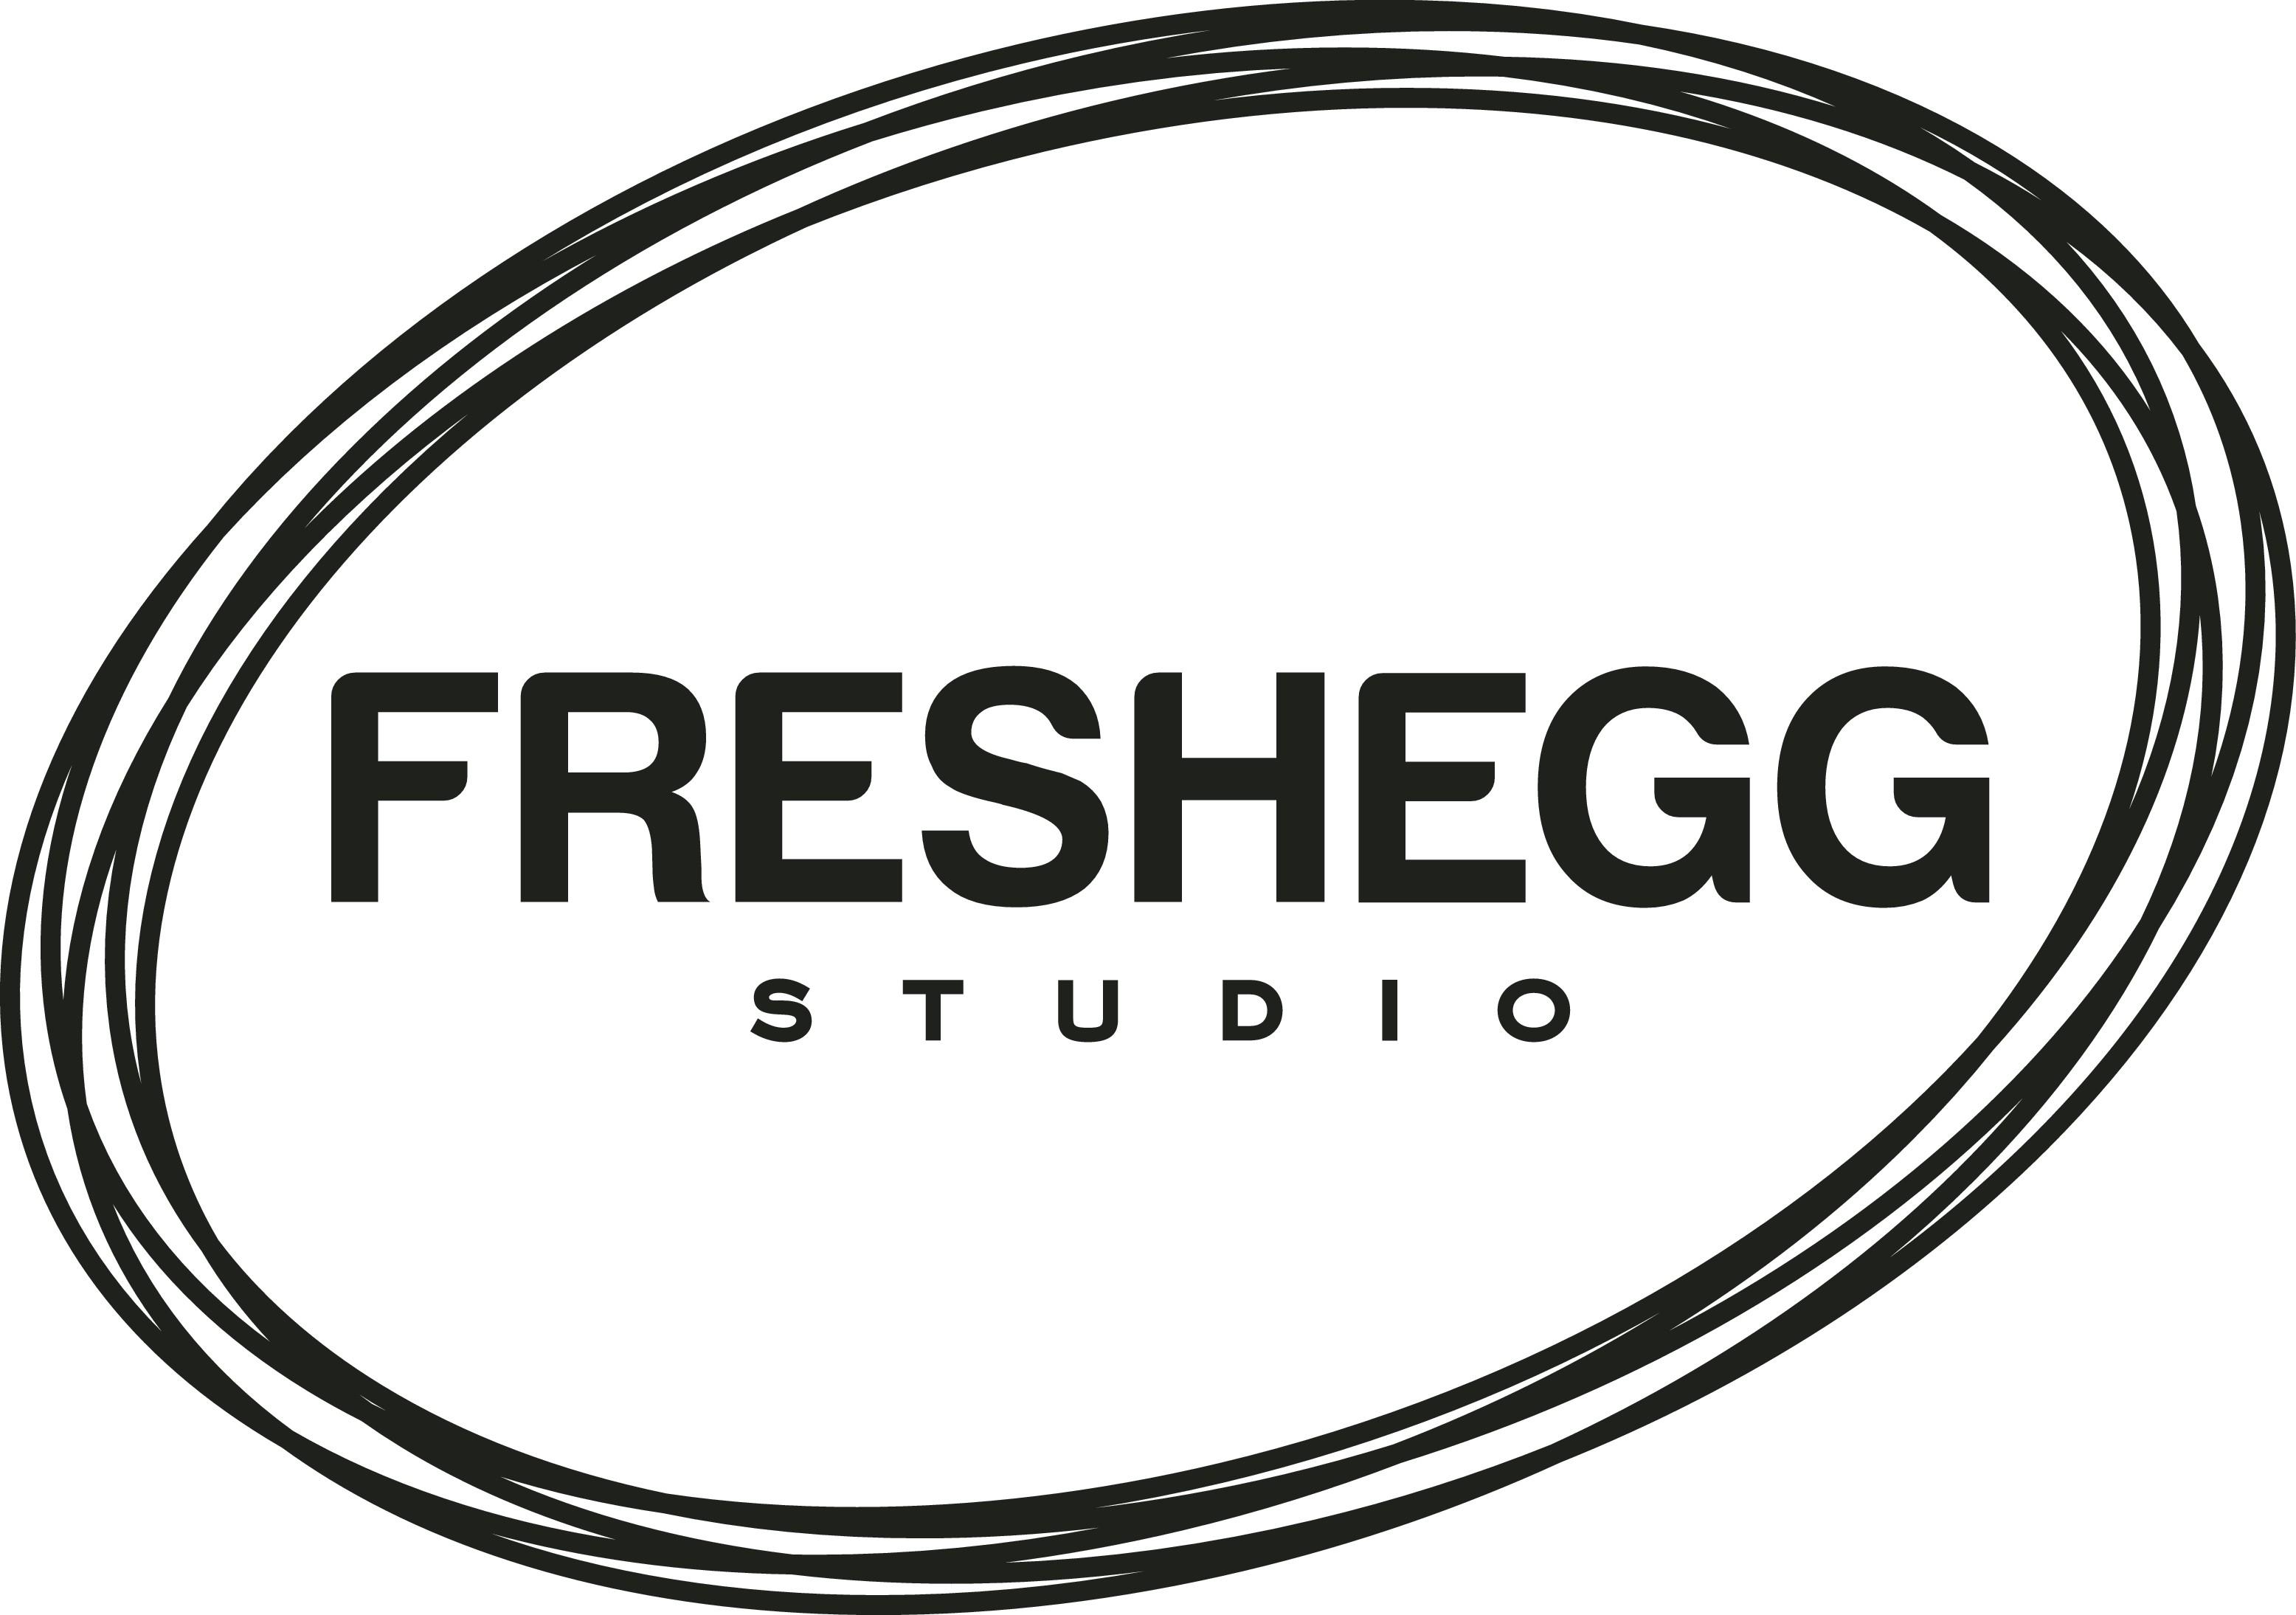 FRESH FUN FRIENDLY COOL & SIMPLE logo for creative cowork studio & e-comm biz